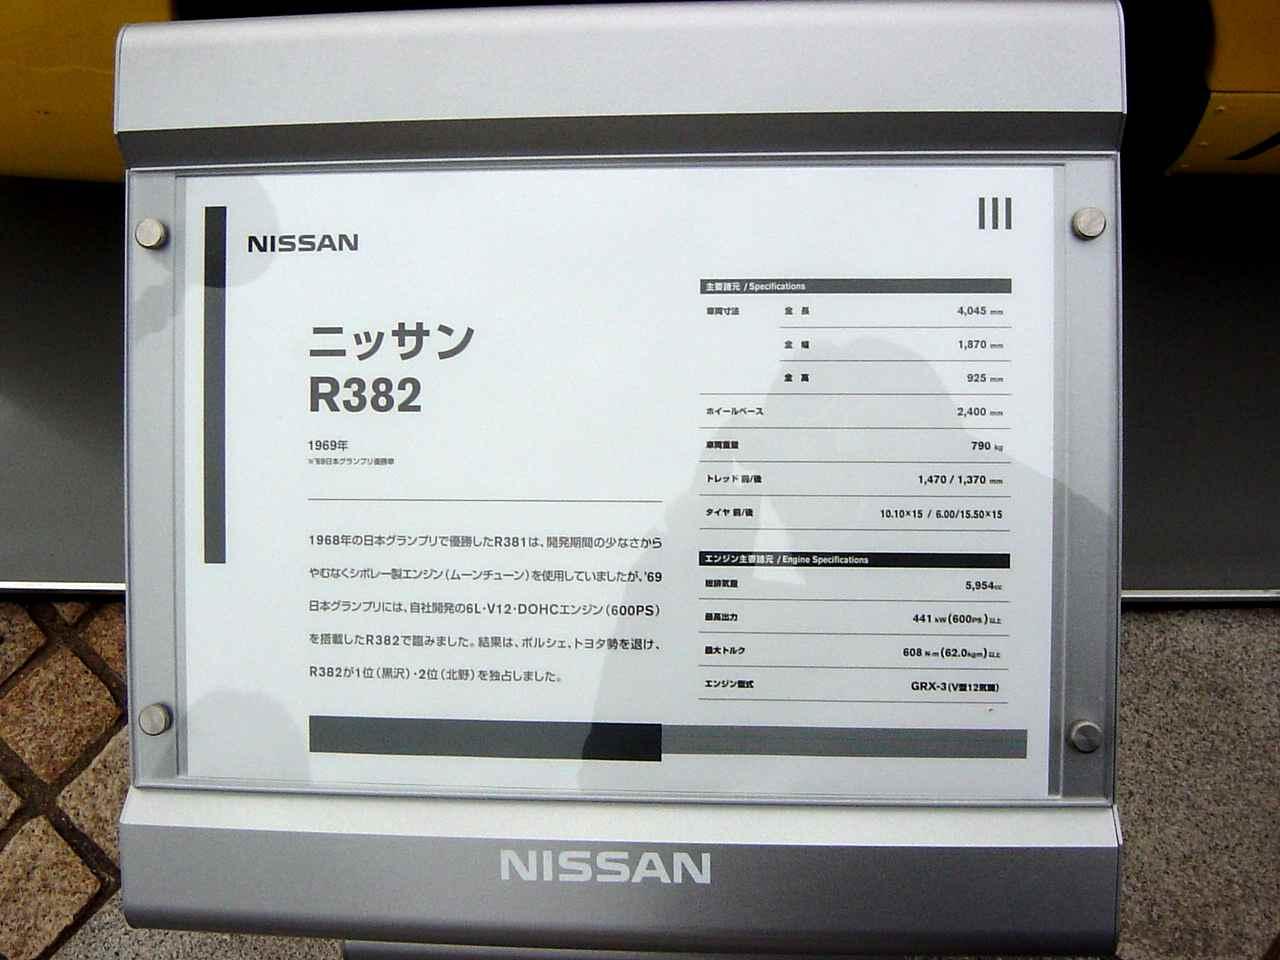 Nissan R382, wyścigowy, sport, japoński samochód, silnik V12, GRX-3, motoryzacja japońska, racing, Japan Grand Prix, 1969, JDM, klasyczny, stary, oldschool, nostalgic, classic, rare, 日産, 日本車, クラシックカー, レーシングカー, 自動車競技, こくないせんようモデル